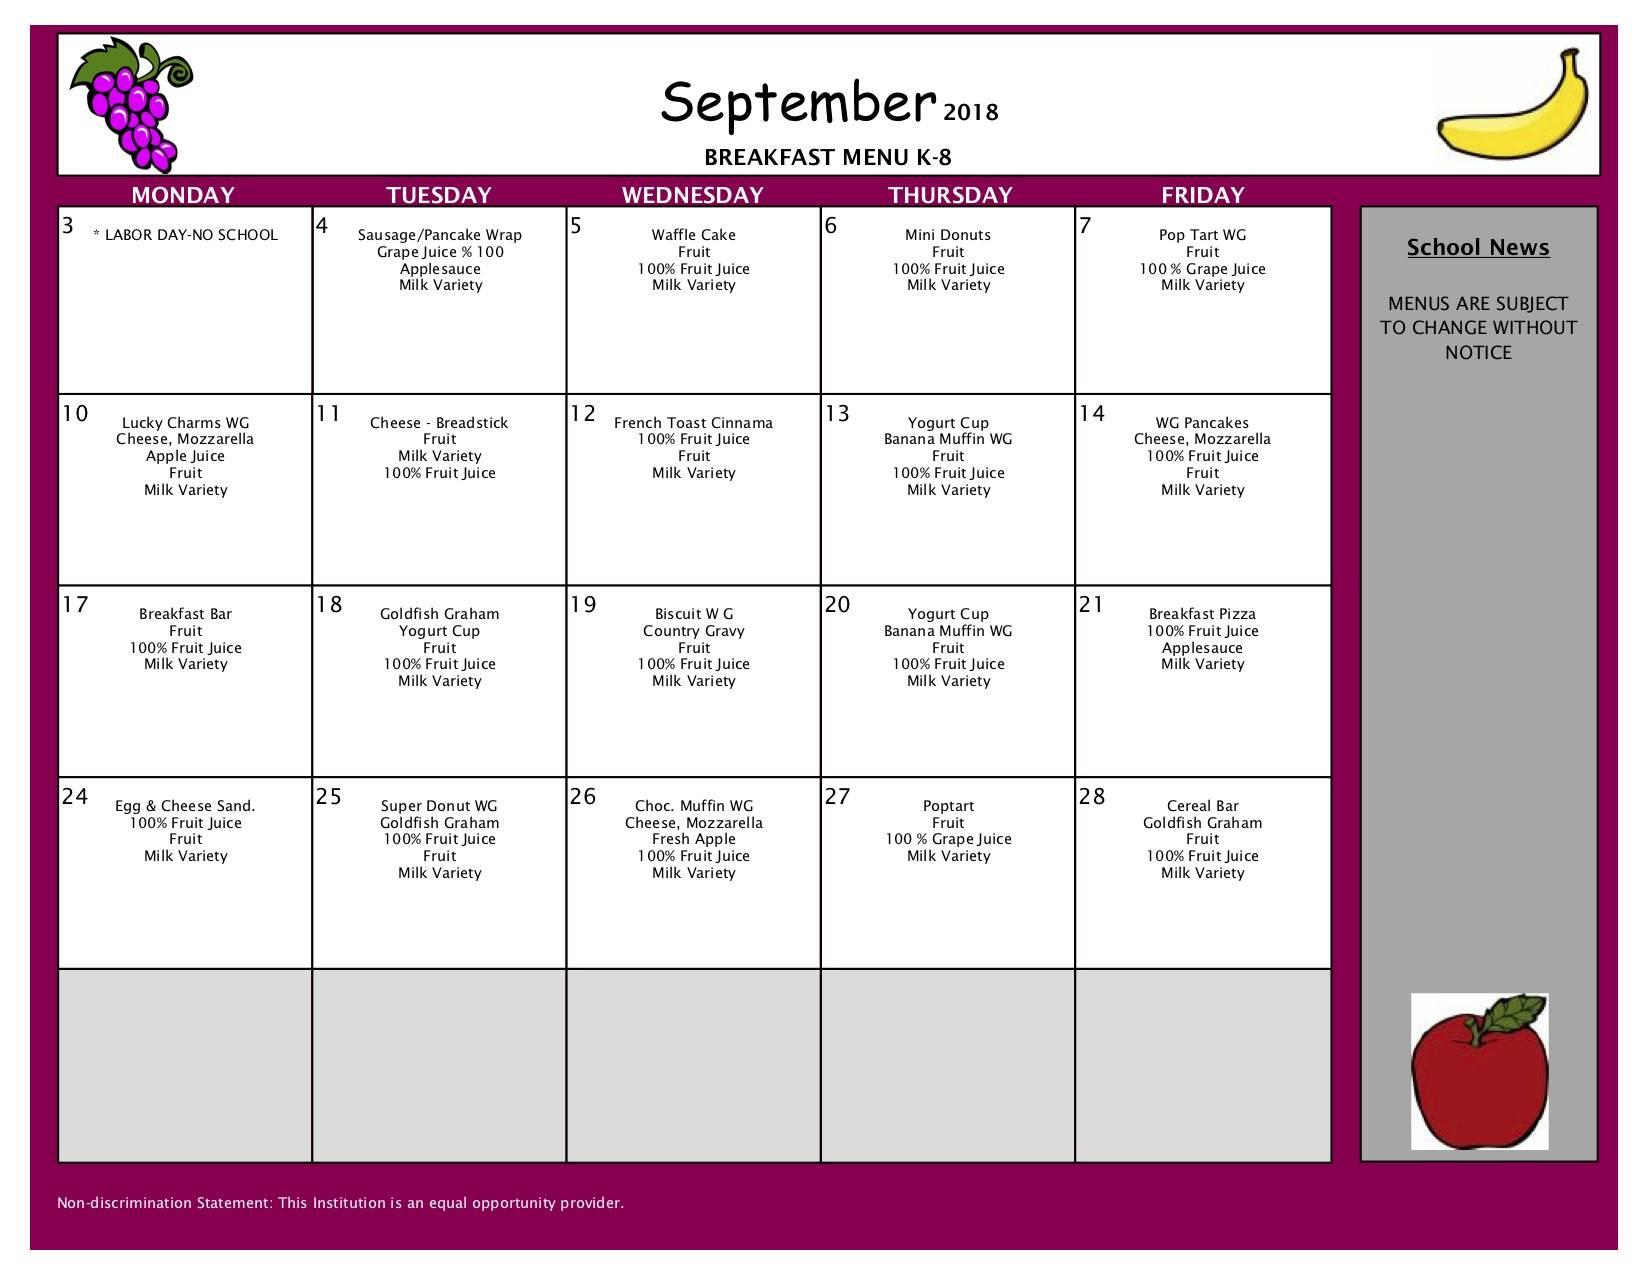 September Breakfast Menu - Elementary and Middle Schools